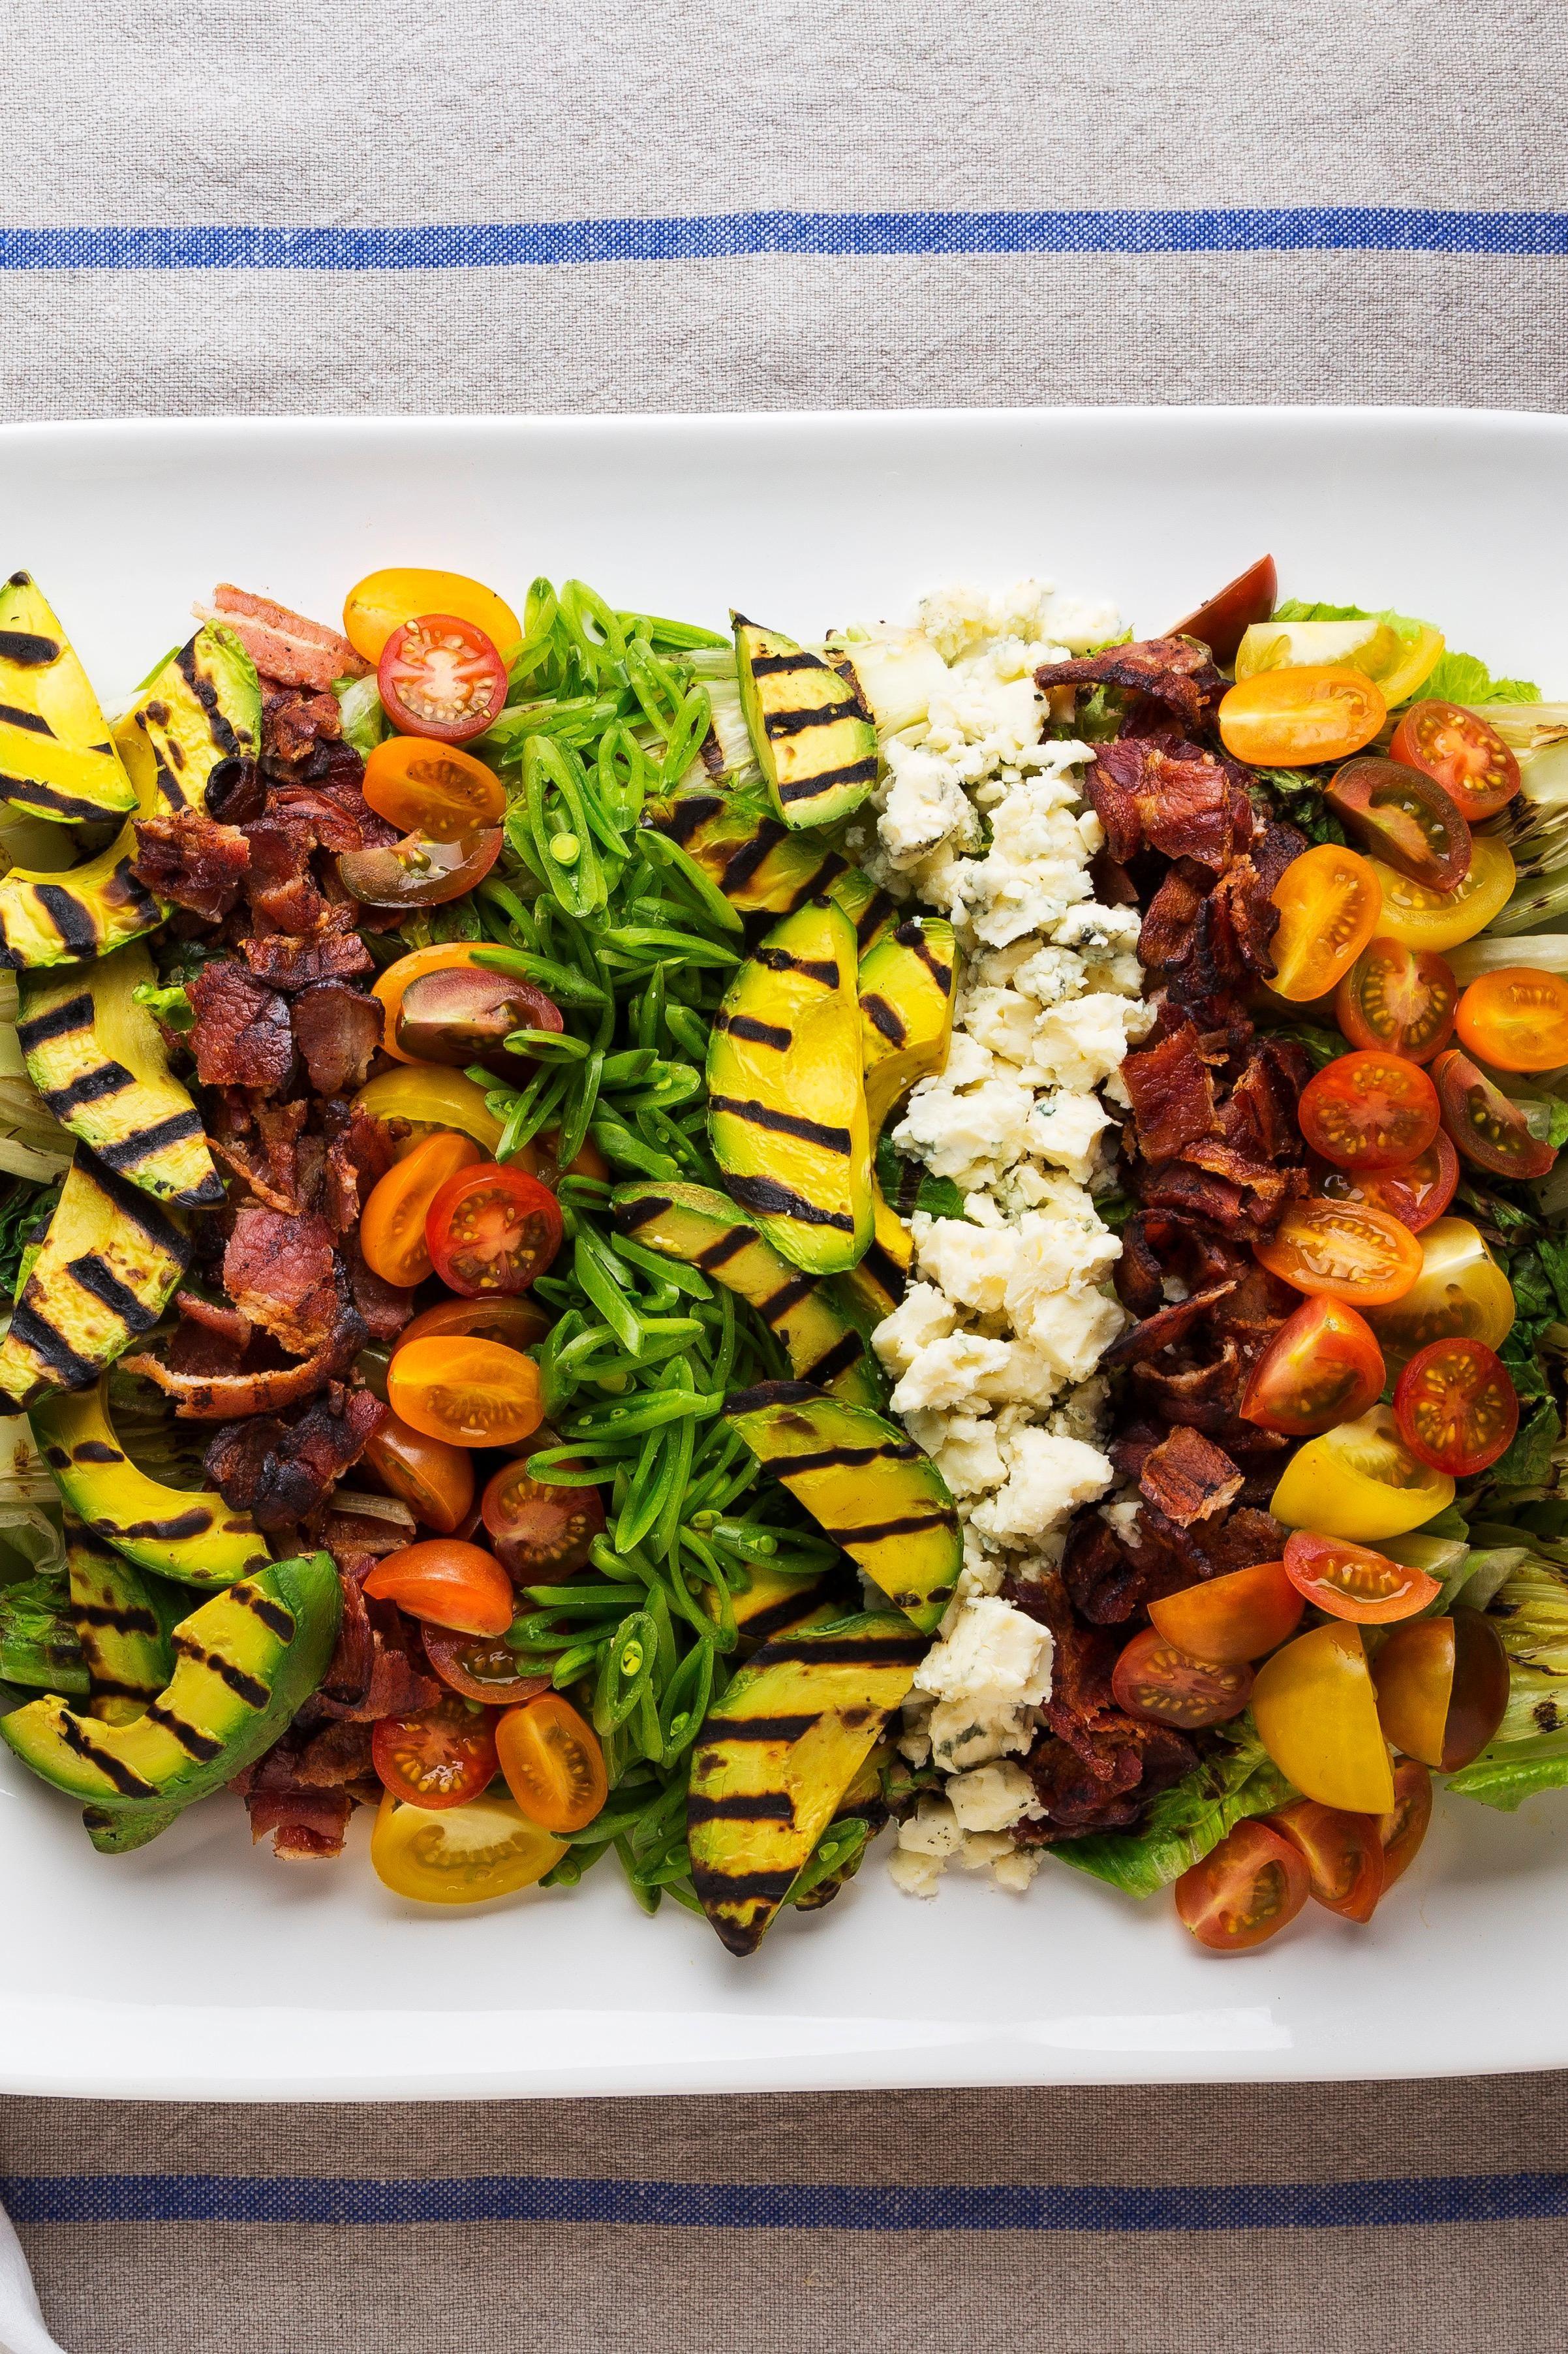 Blackened Skirt Steak BLT Salad recommendations